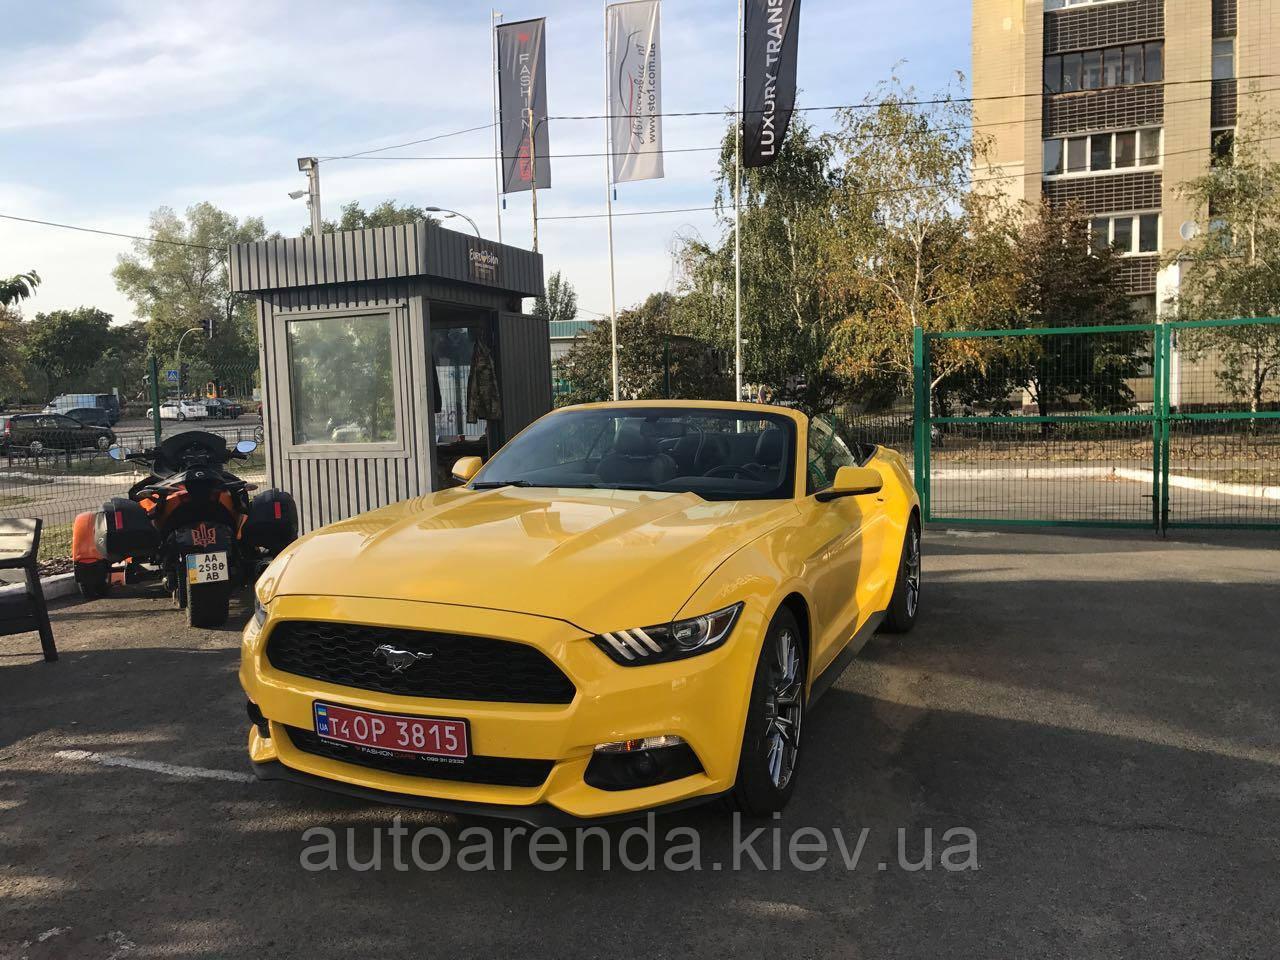 Оренда нового кабріолета Ford Mustang